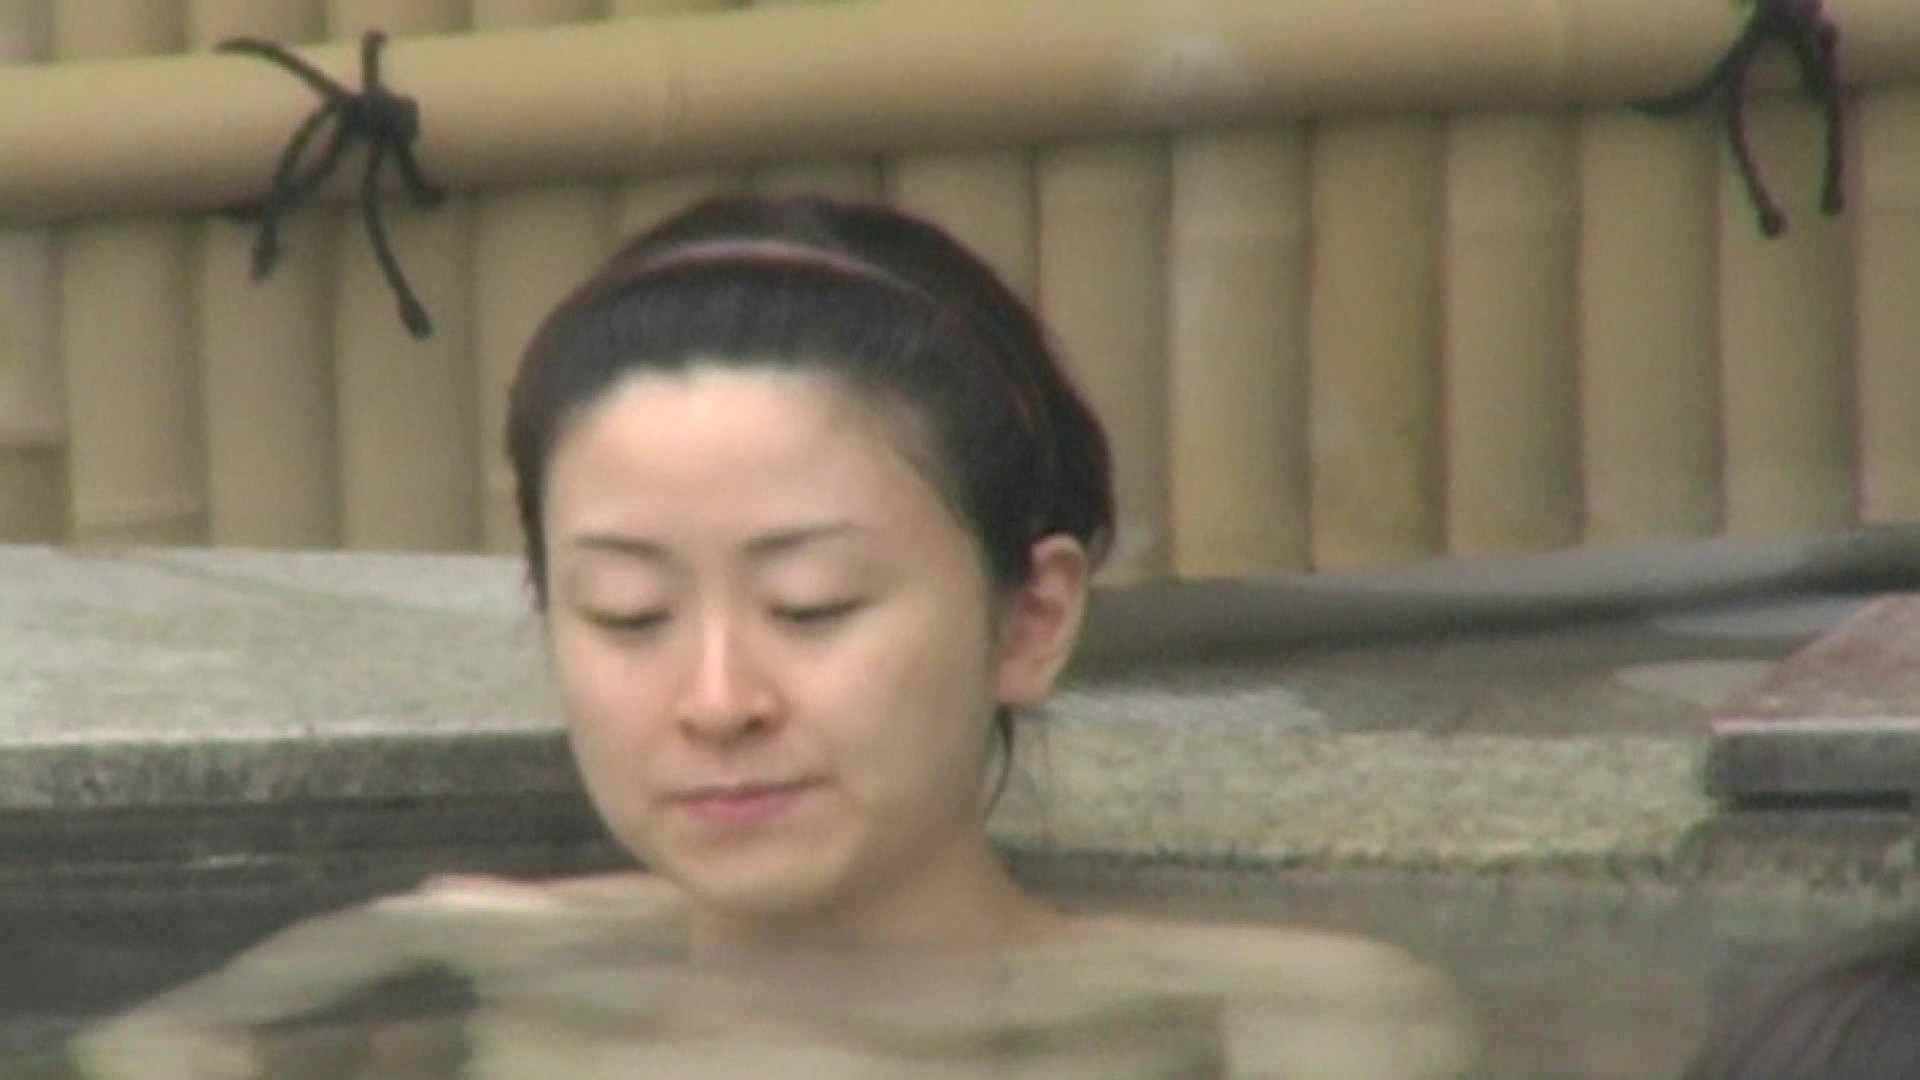 Aquaな露天風呂Vol.548 女体盗撮 | OL女体  70連発 19